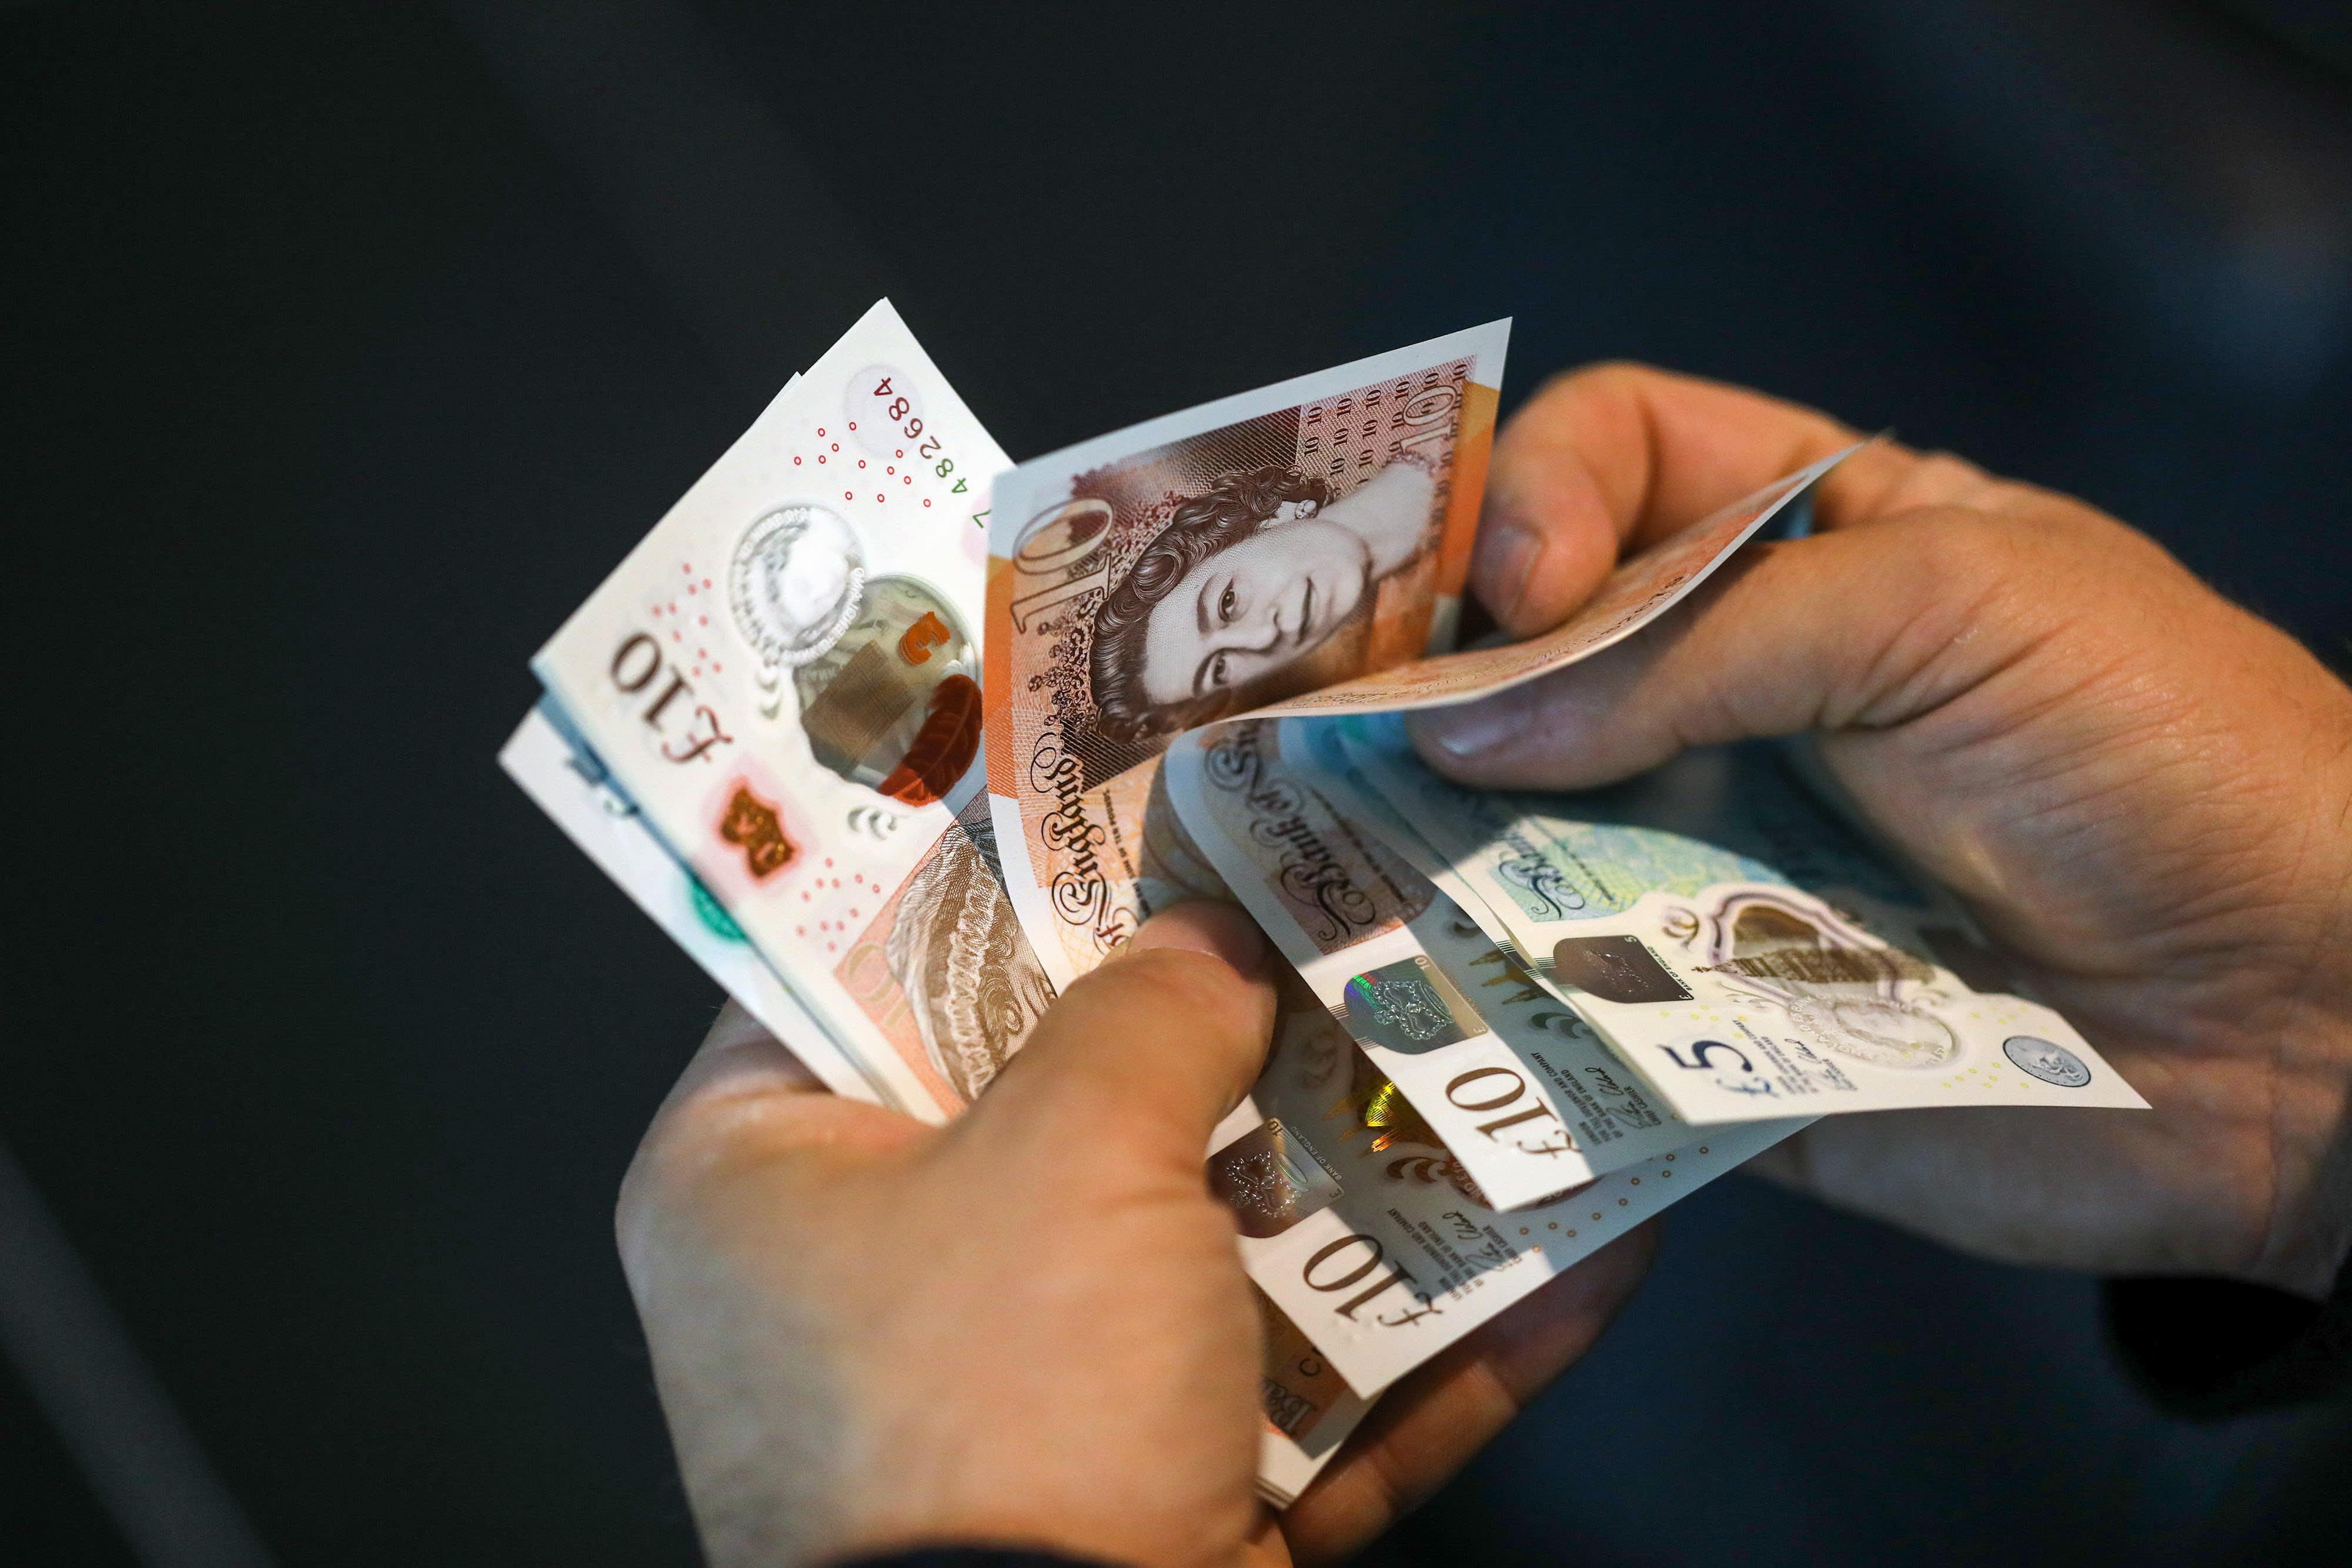 Pension fraudster ordered to pay back £290k